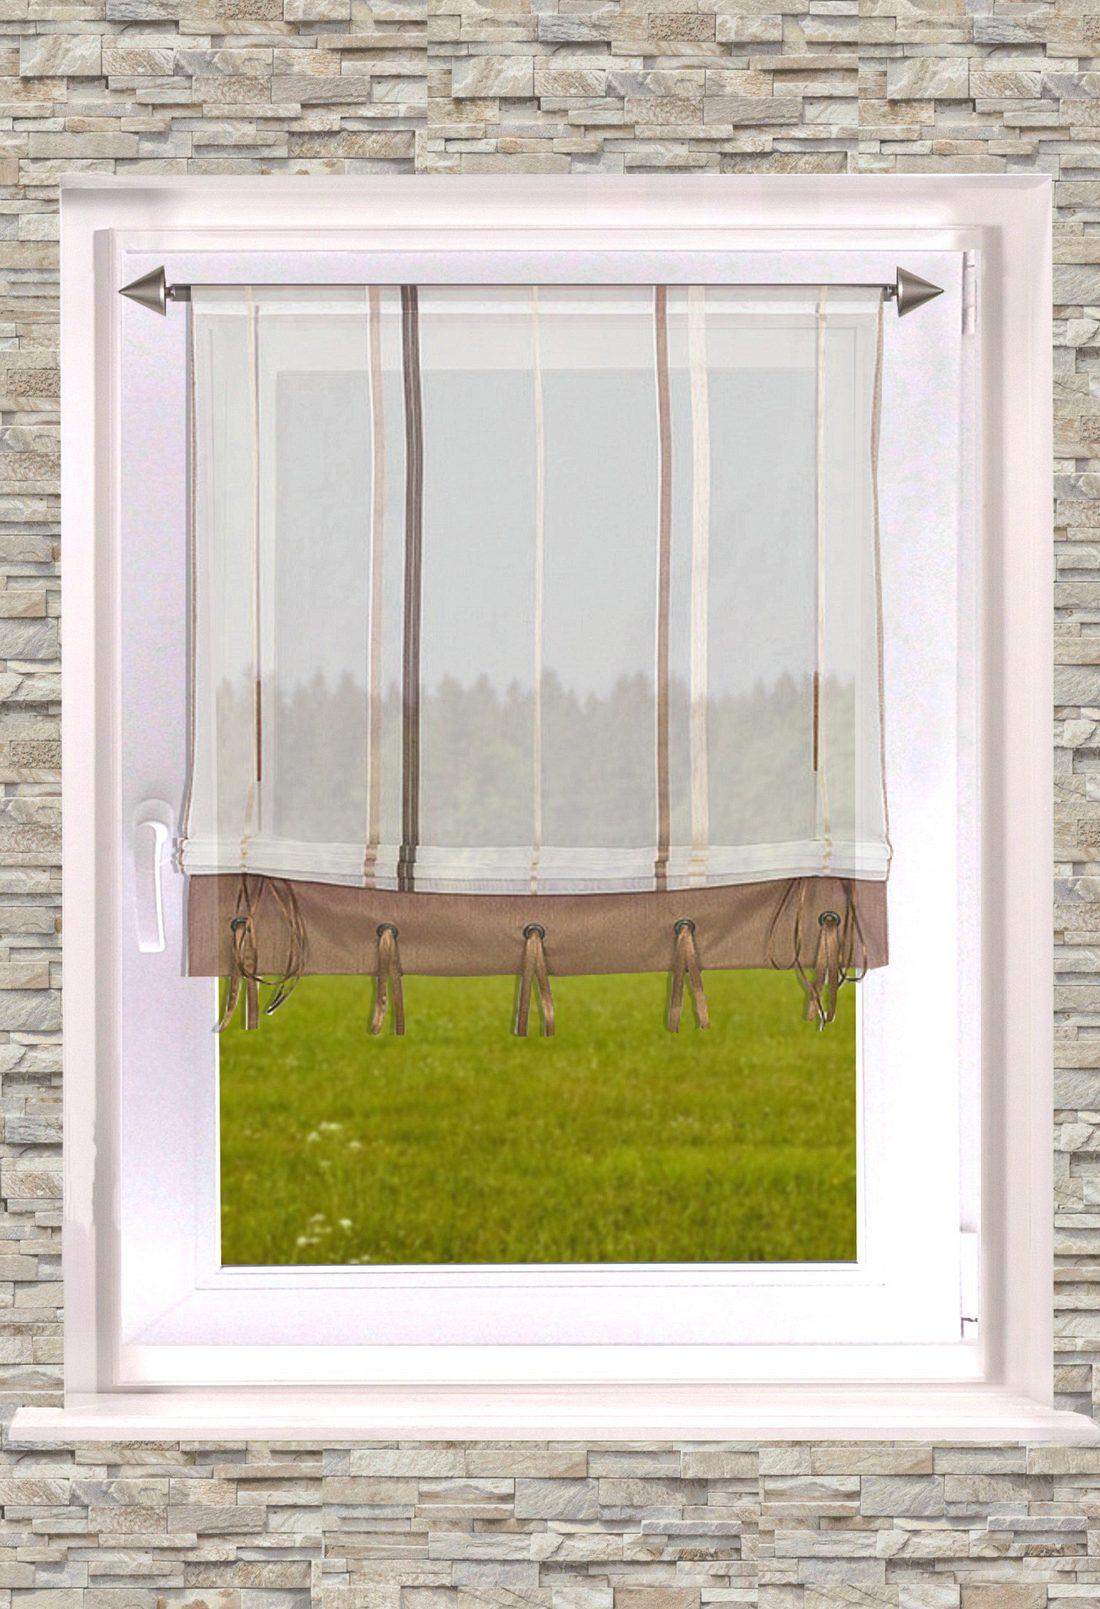 gestreiftes raffrollo stripes b ndchenrollo in 2 farben transparent 60cm 100cm x135cm. Black Bedroom Furniture Sets. Home Design Ideas